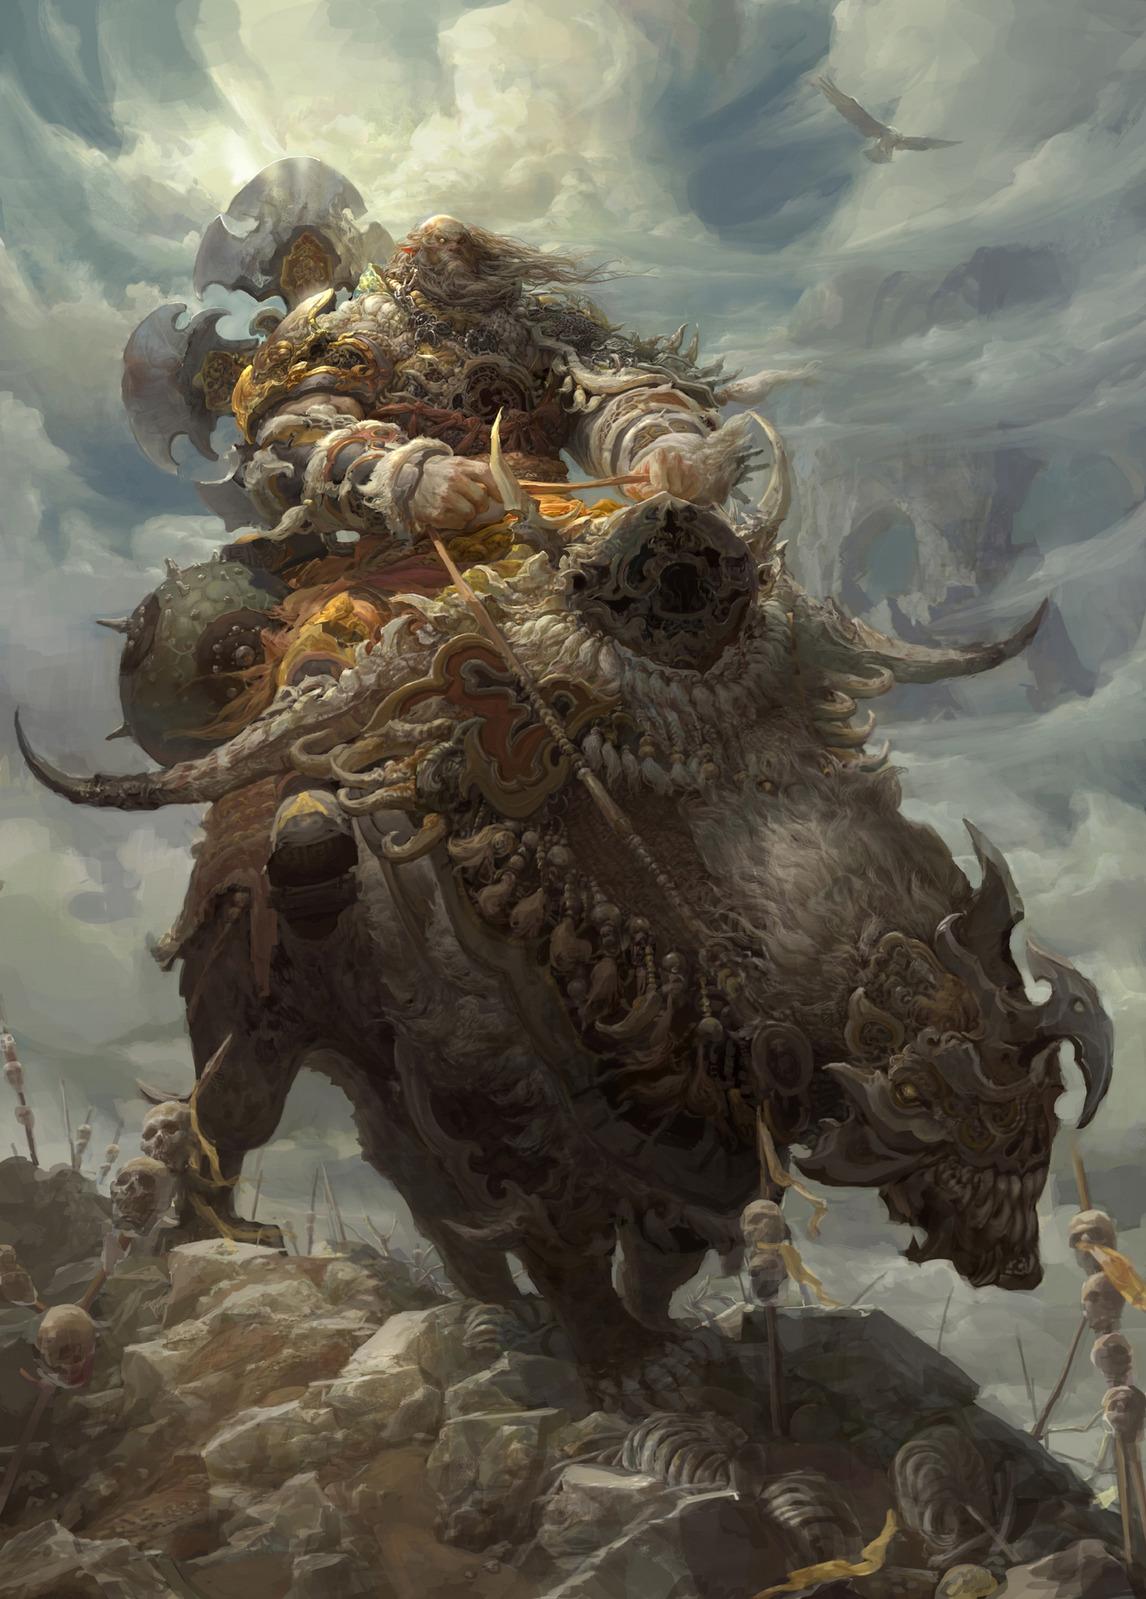 Les digital paintings de batailles épiques de Fenghua Zhong